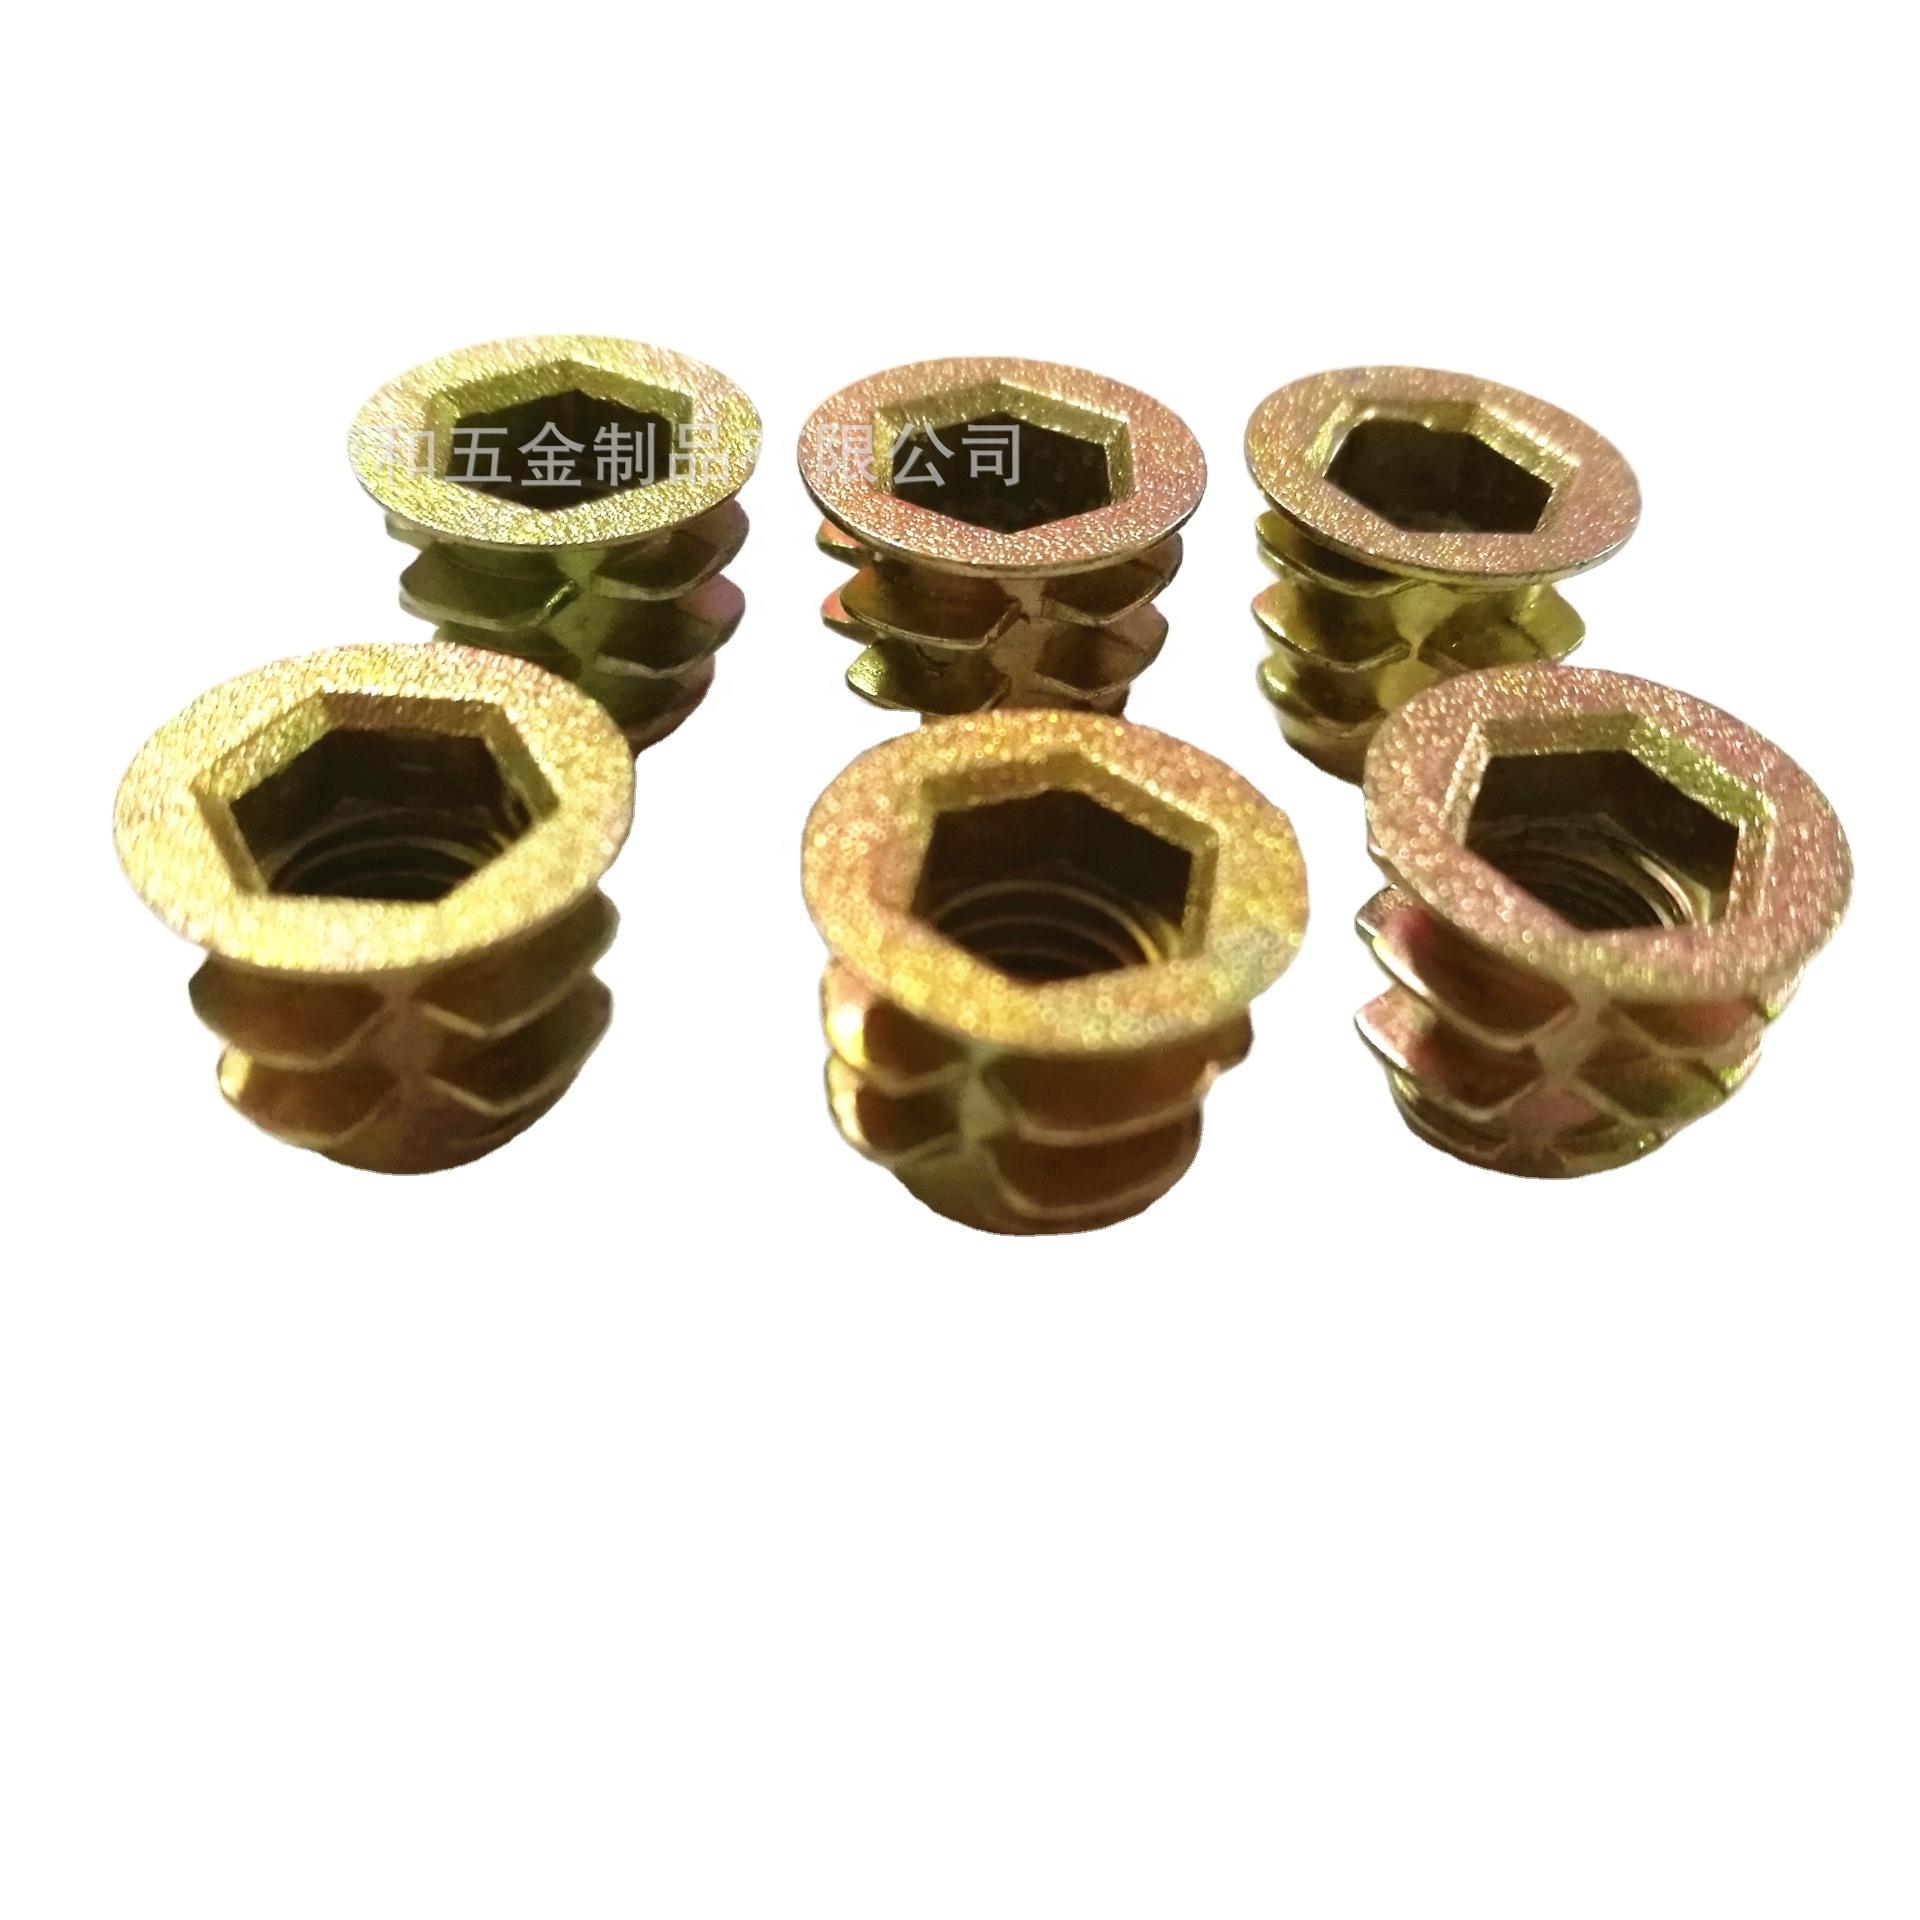 Internal and external threaded wood furniture insert metal nuts rivet kirsite nuts M6*10